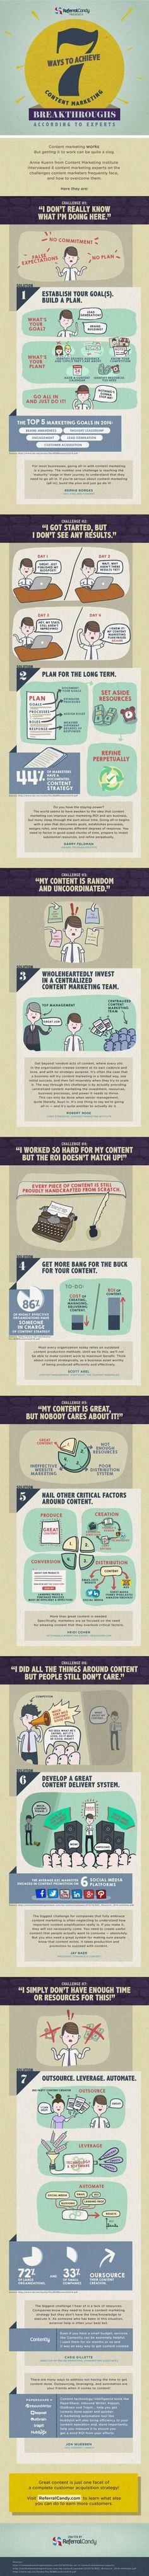 7 Ways To Achieve Content Marketing Breakthroughs   #infographic #ContentMarketing #marketing: